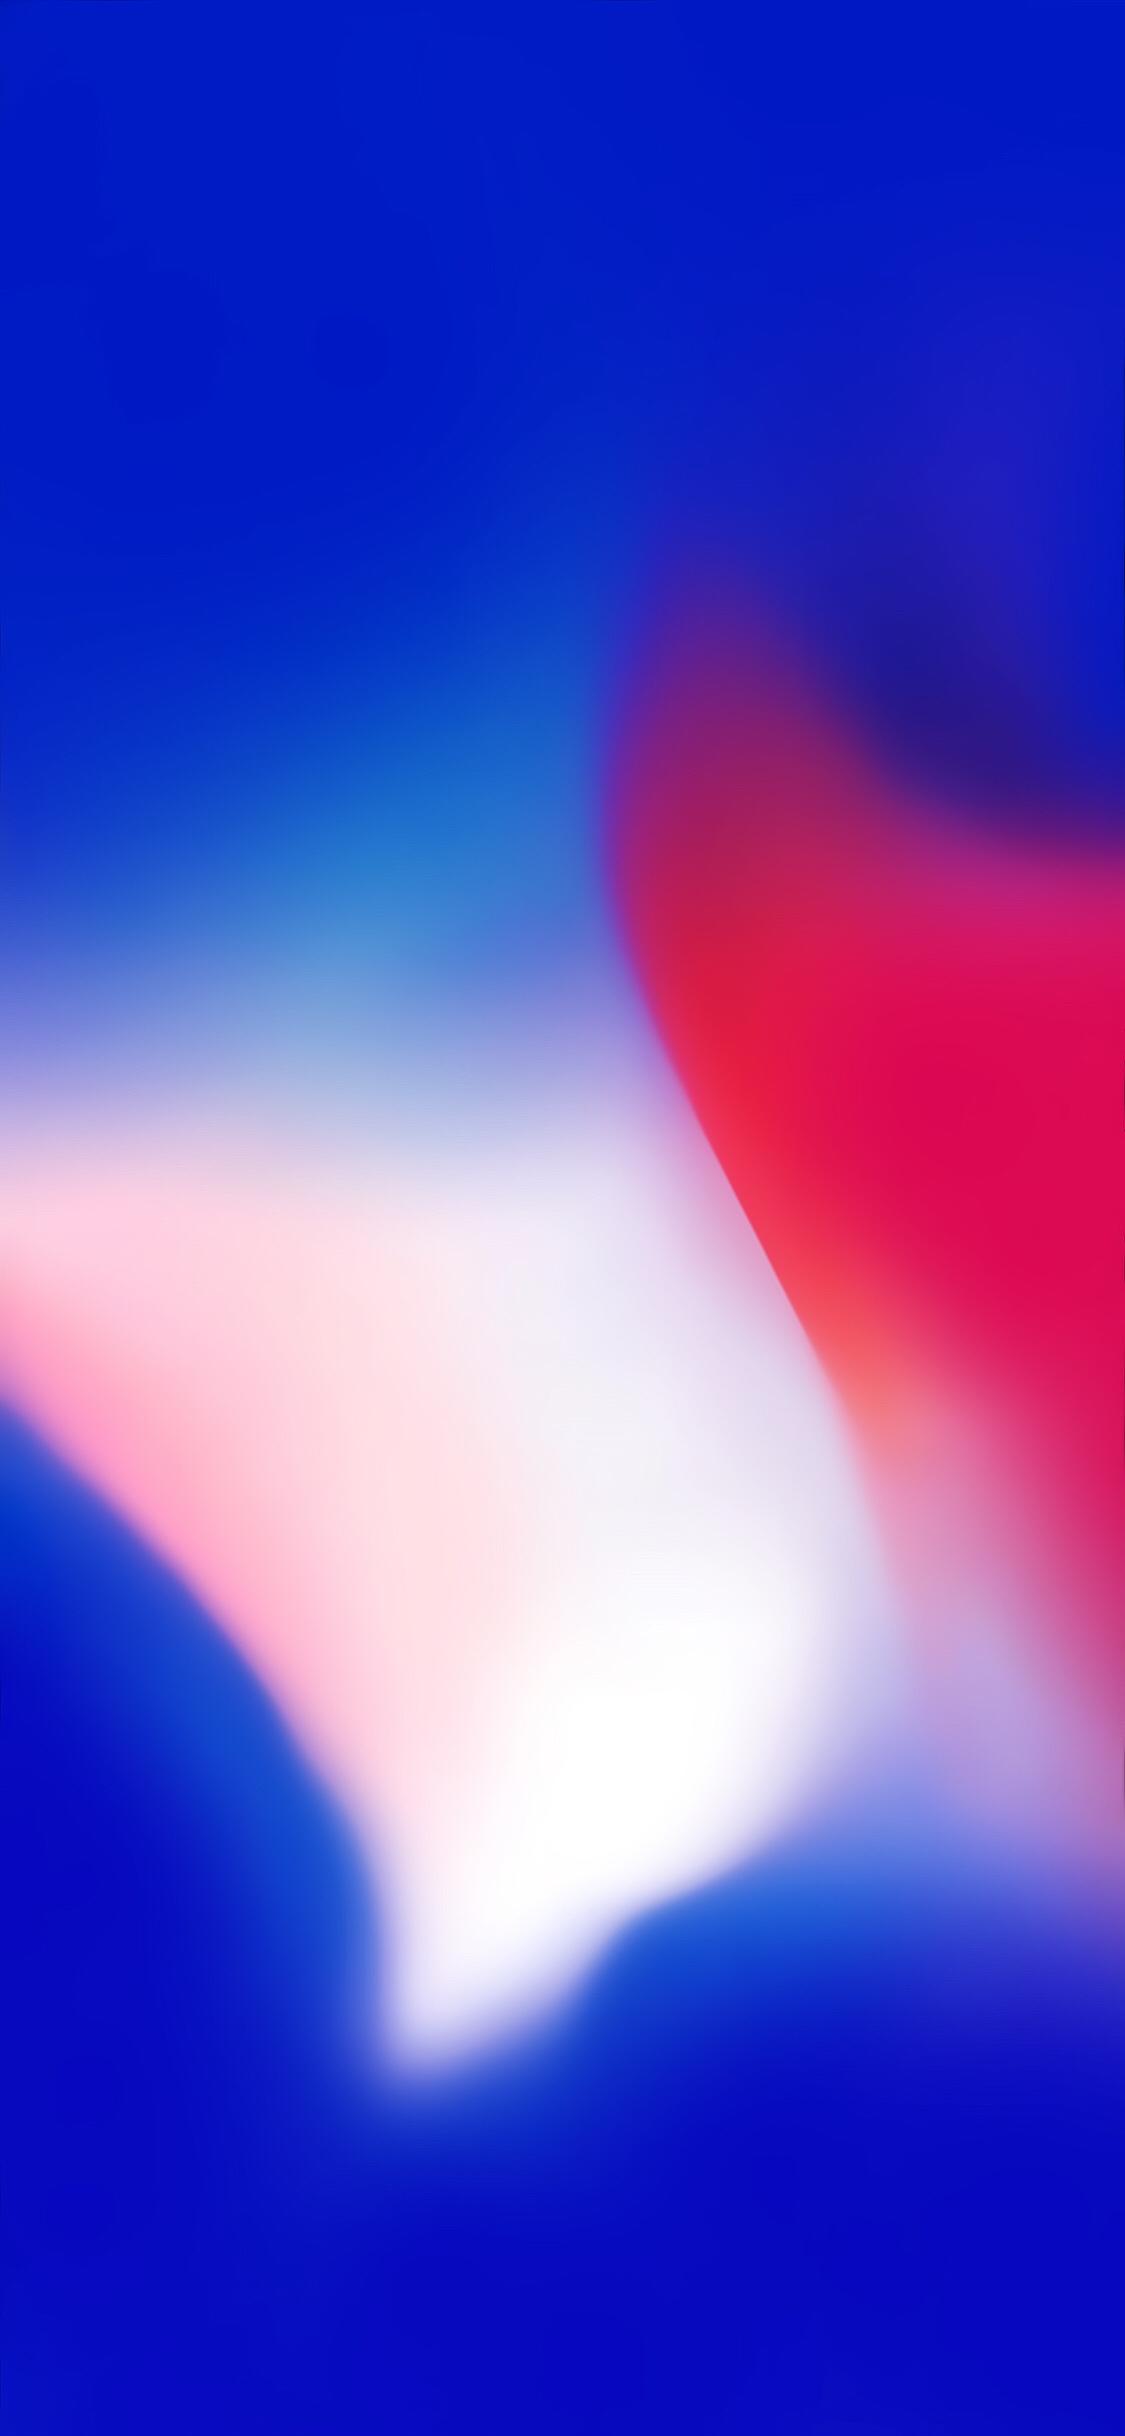 Pin Oleh Vahag Hakhverdyan Di Iphone 11 Wallpapers Wallpaper Ponsel Ponsel